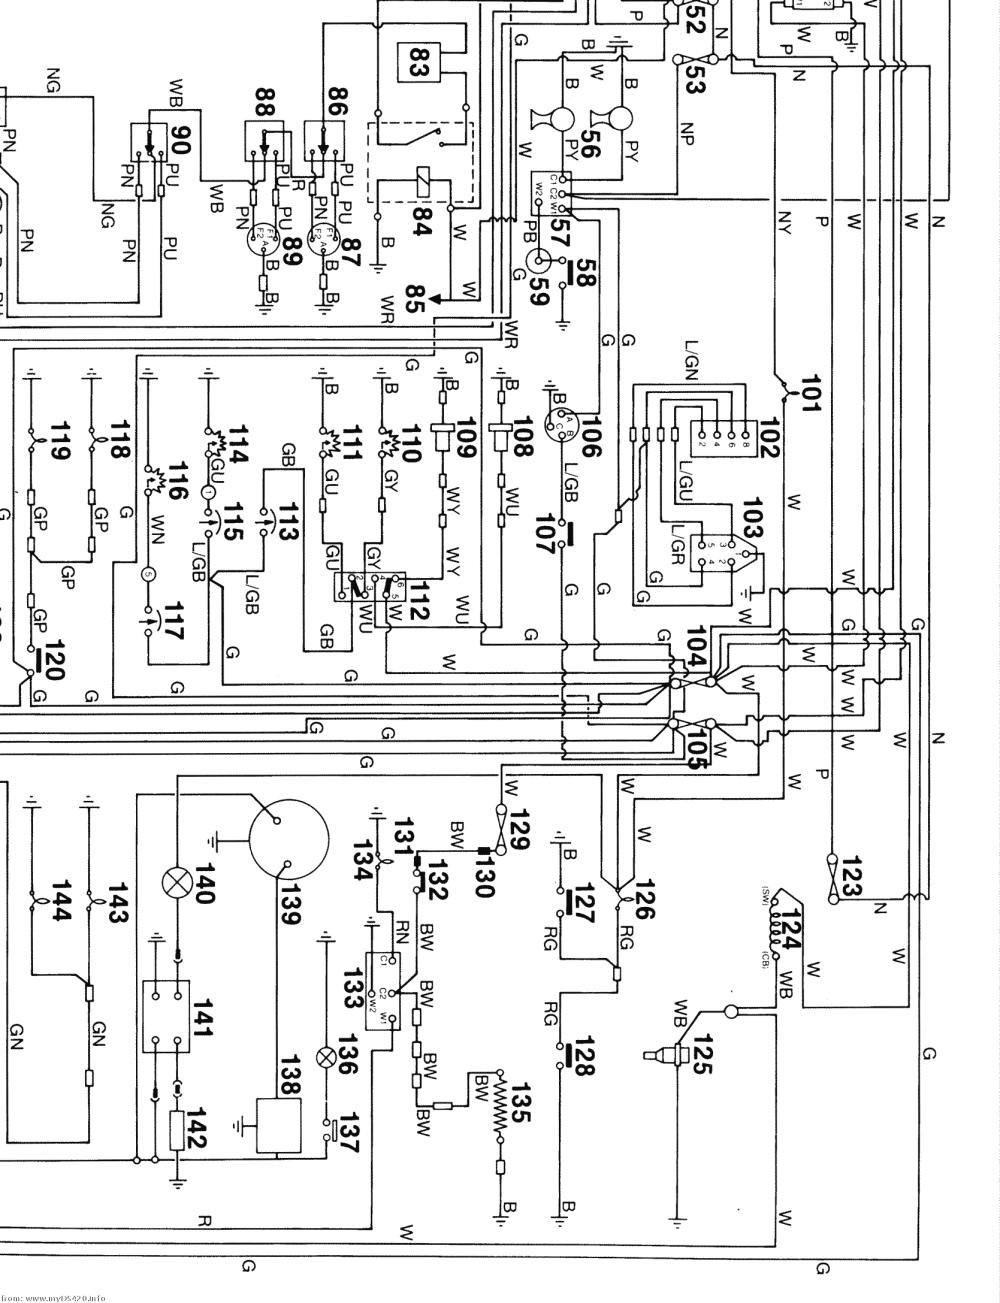 medium resolution of yfz 450 wiring diagram yfz 450 screw wiring diagram odicis 05 yfz 450 race 05 yfz 450 race